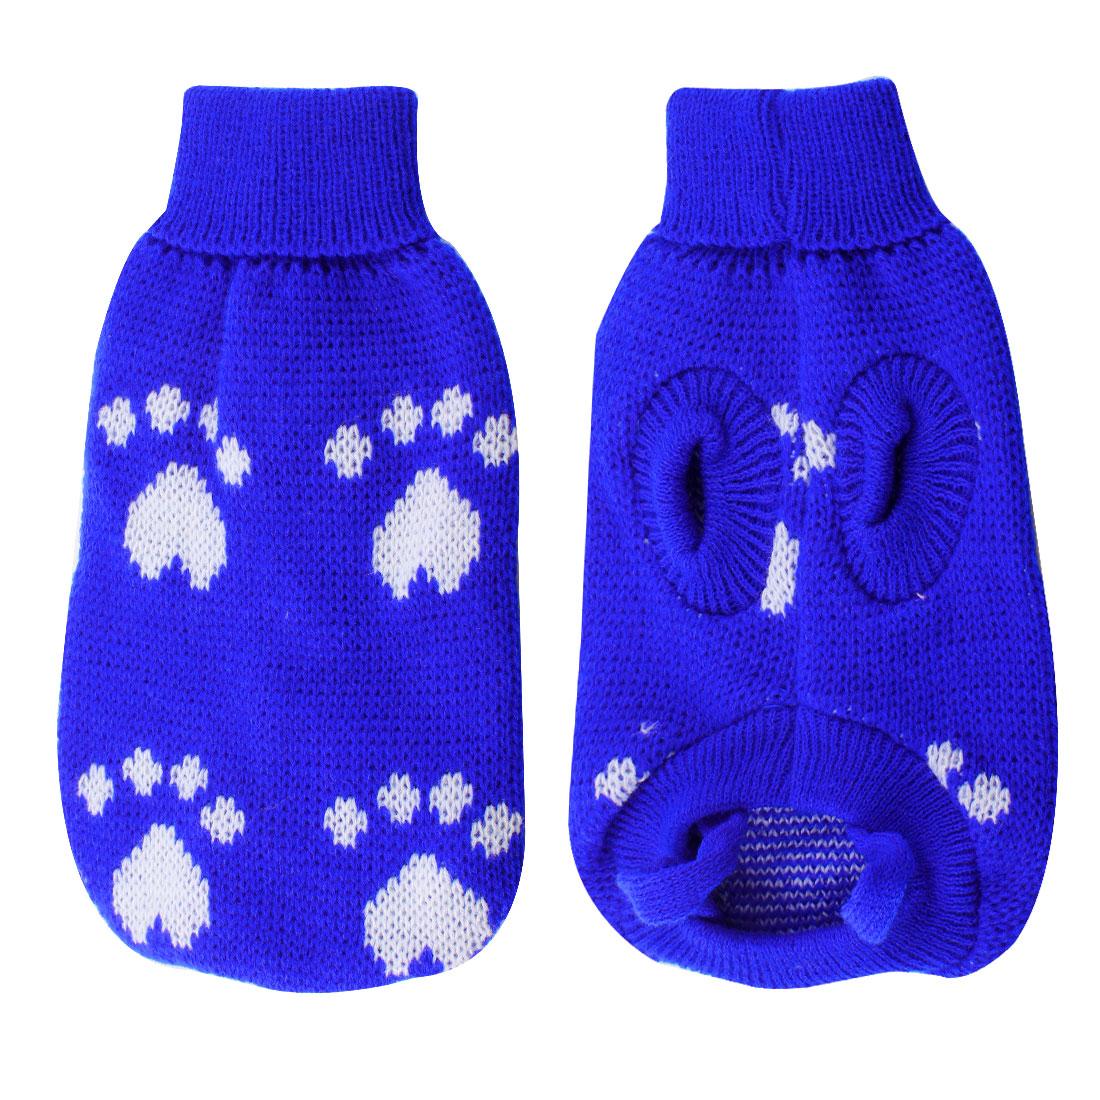 Pet Dog Puppy Knitting Turtleneck Paw Pattern Sweater Apparel Blue White Size XXS